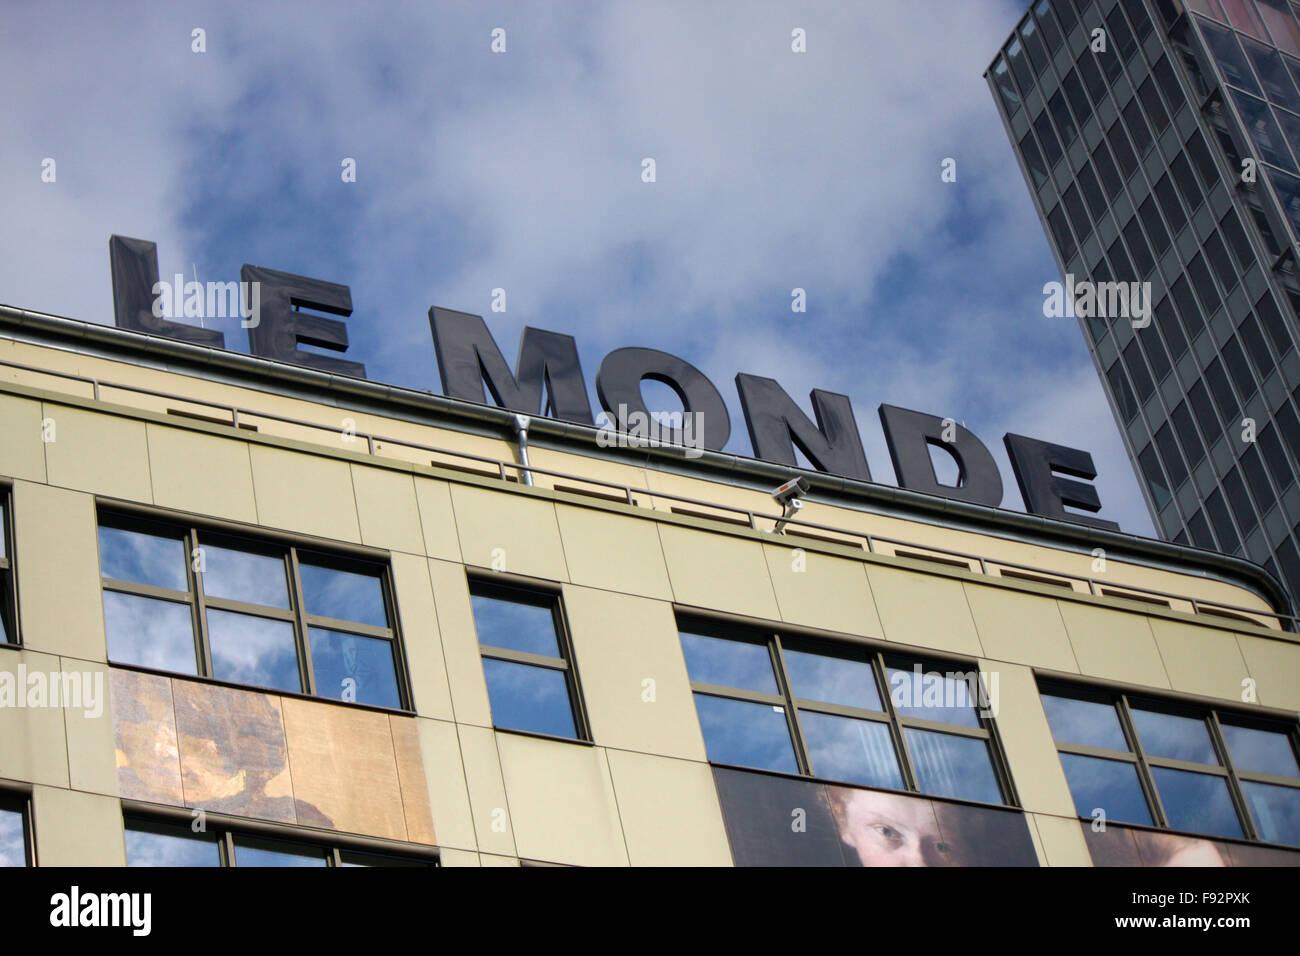 Markenname: 'Le Monde', Berlin. - Stock Image